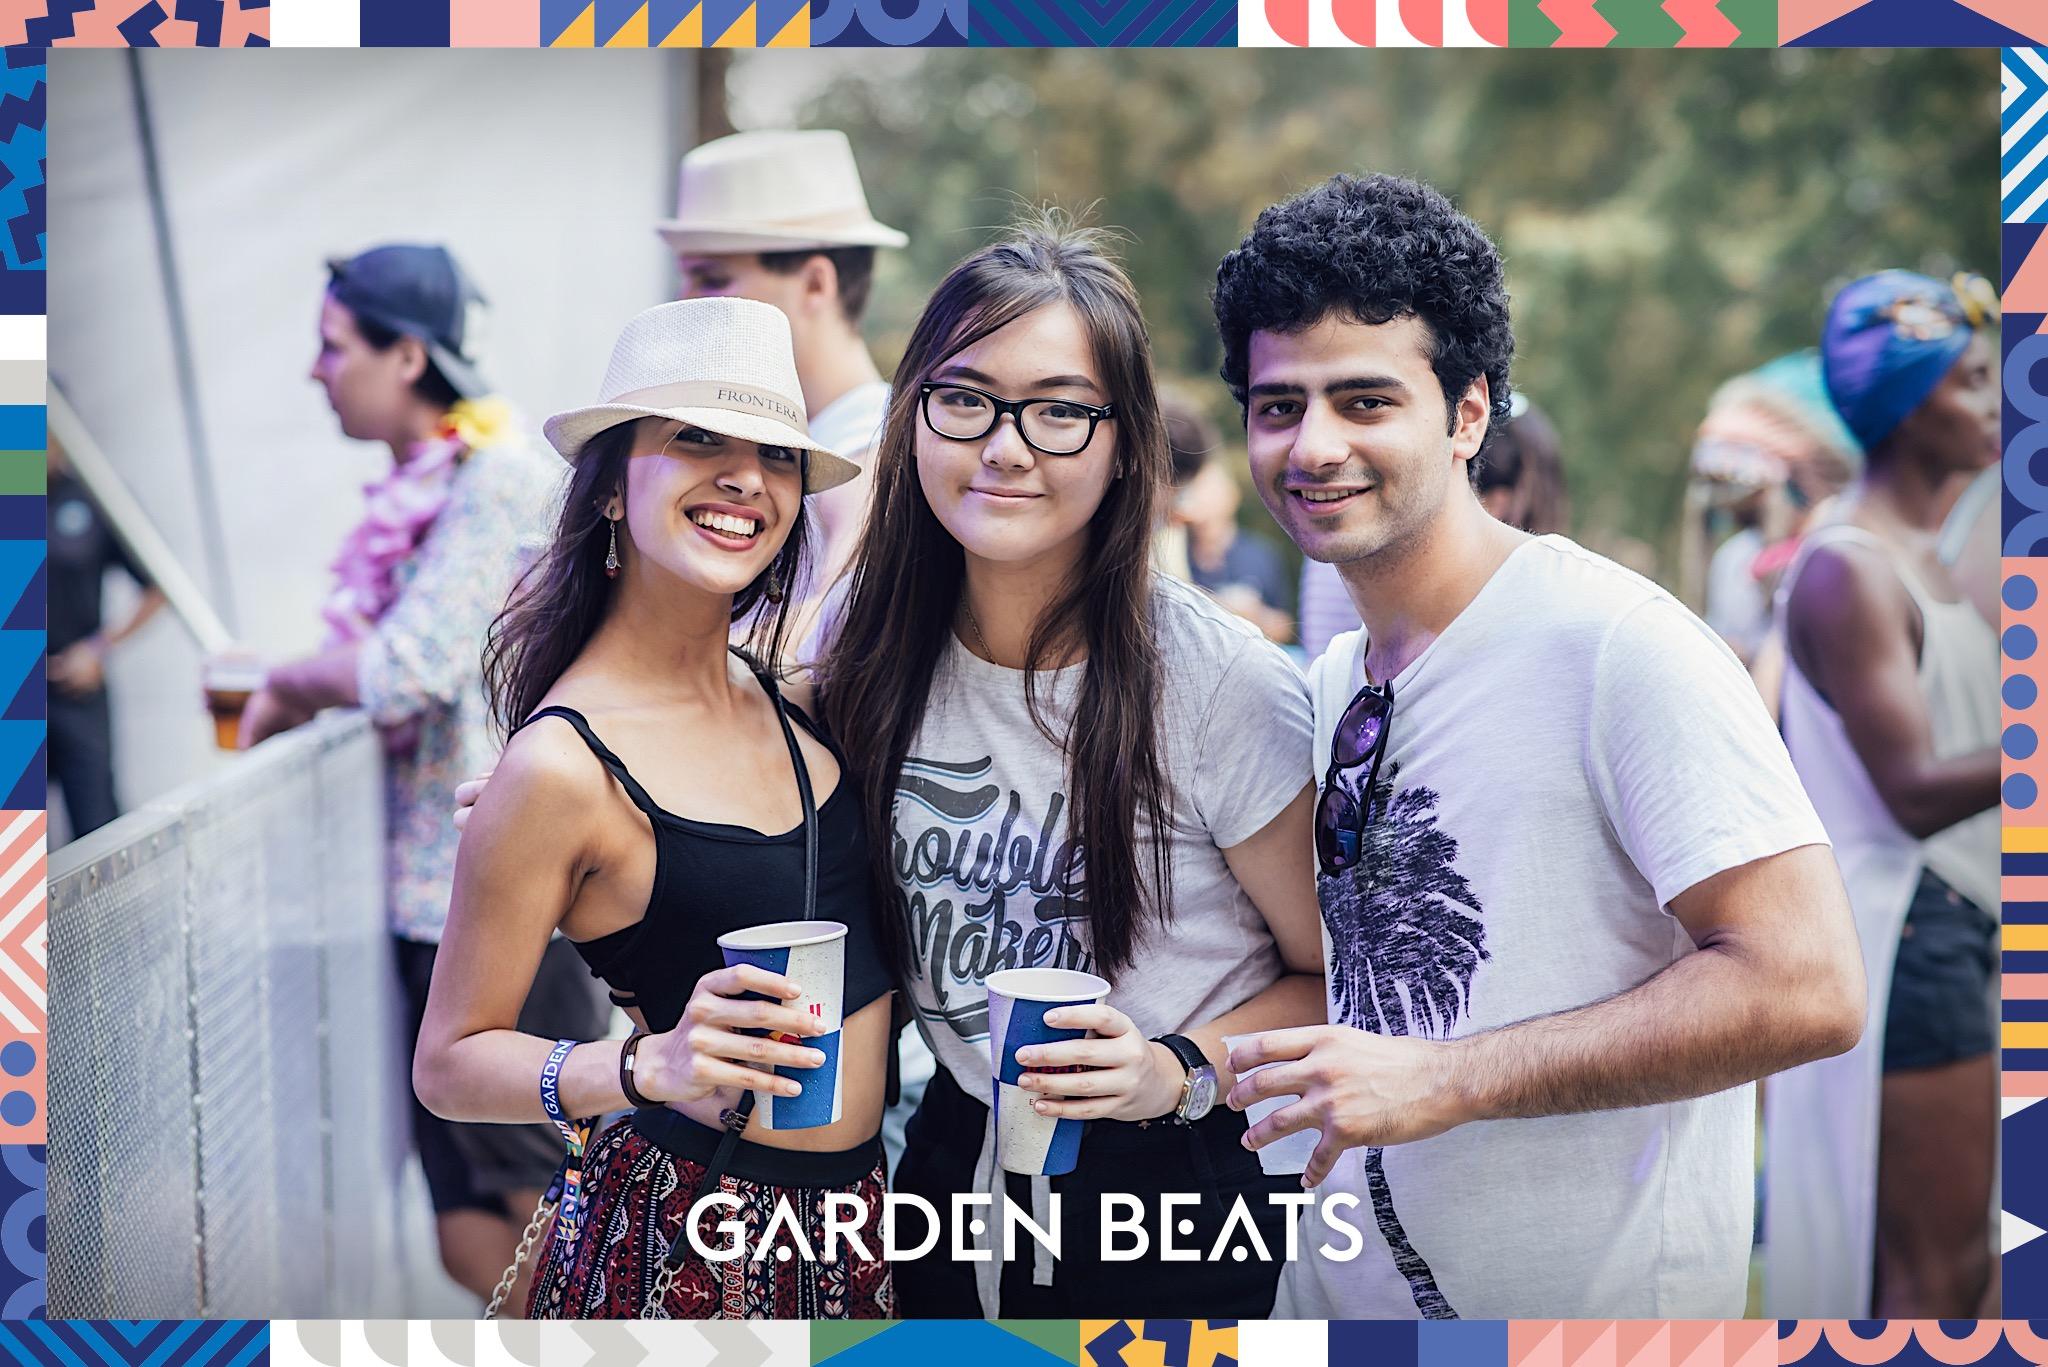 18032017_GardenBeats_Colossal630_WatermarkedGB.jpg